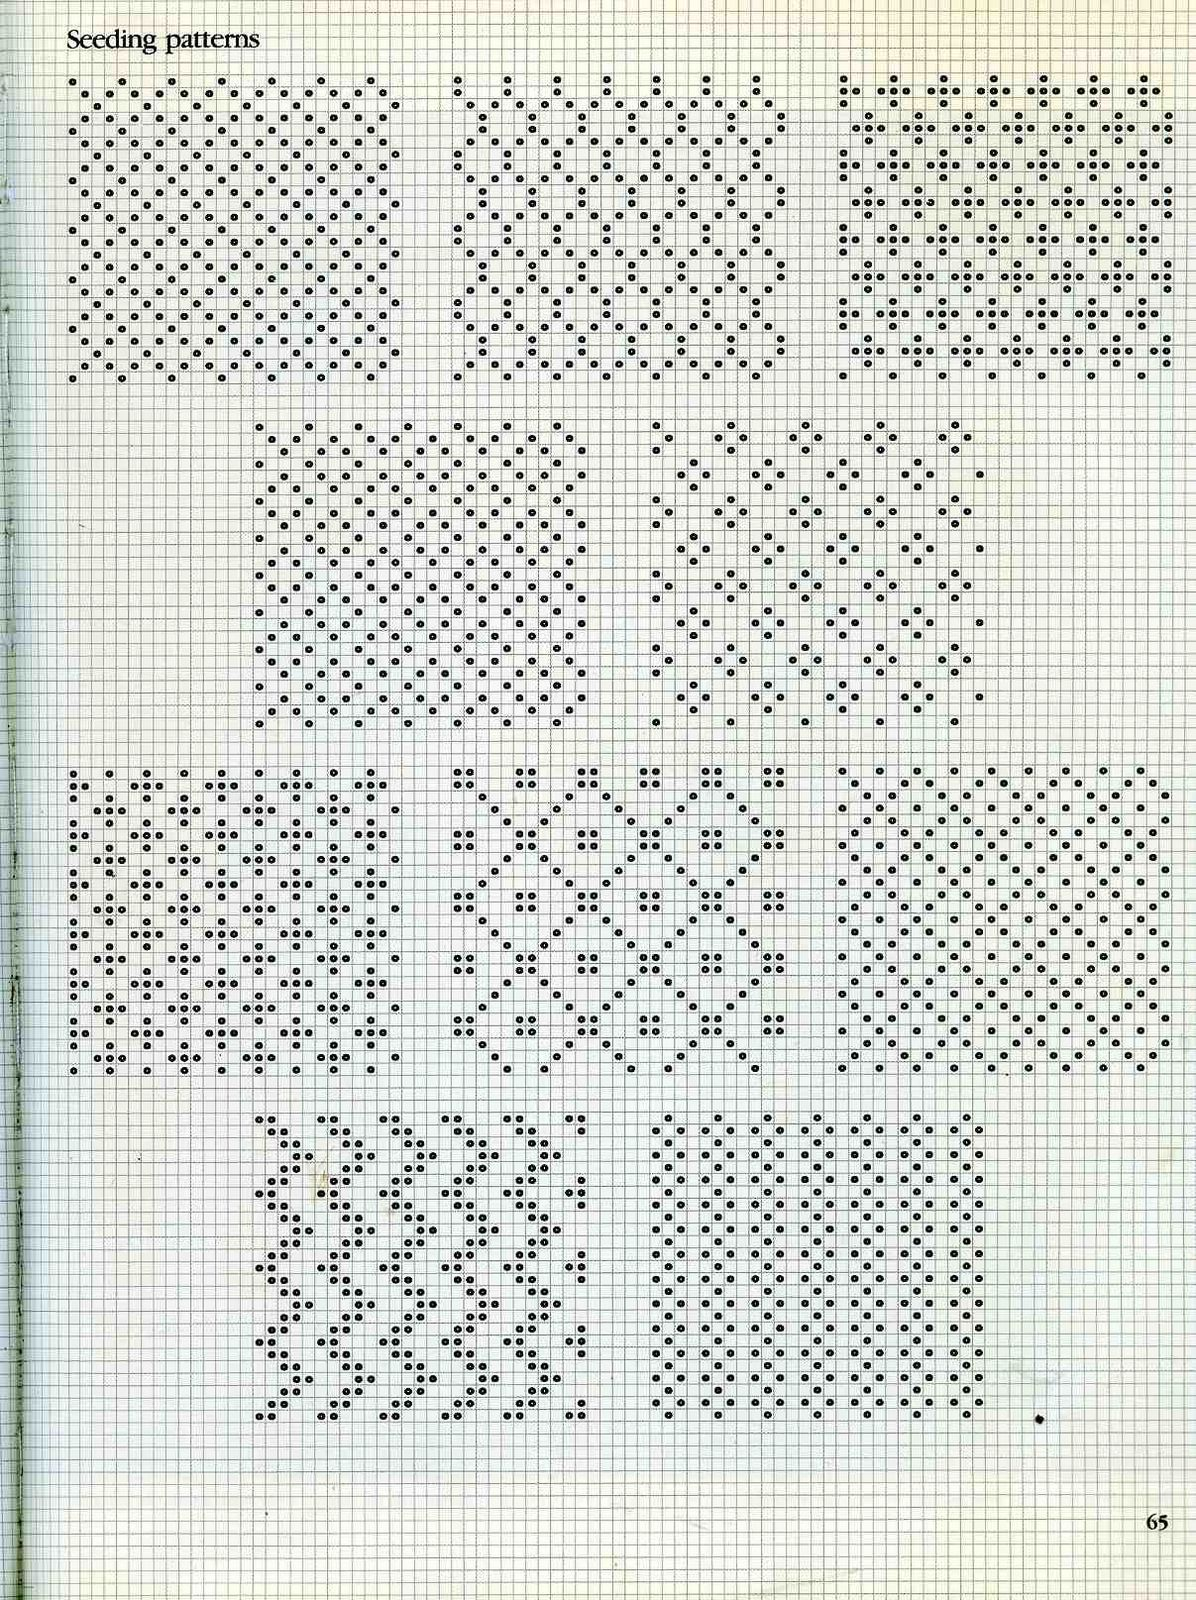 Pin by Melissa Covaleski on Knitting | Pinterest | Knitting ...